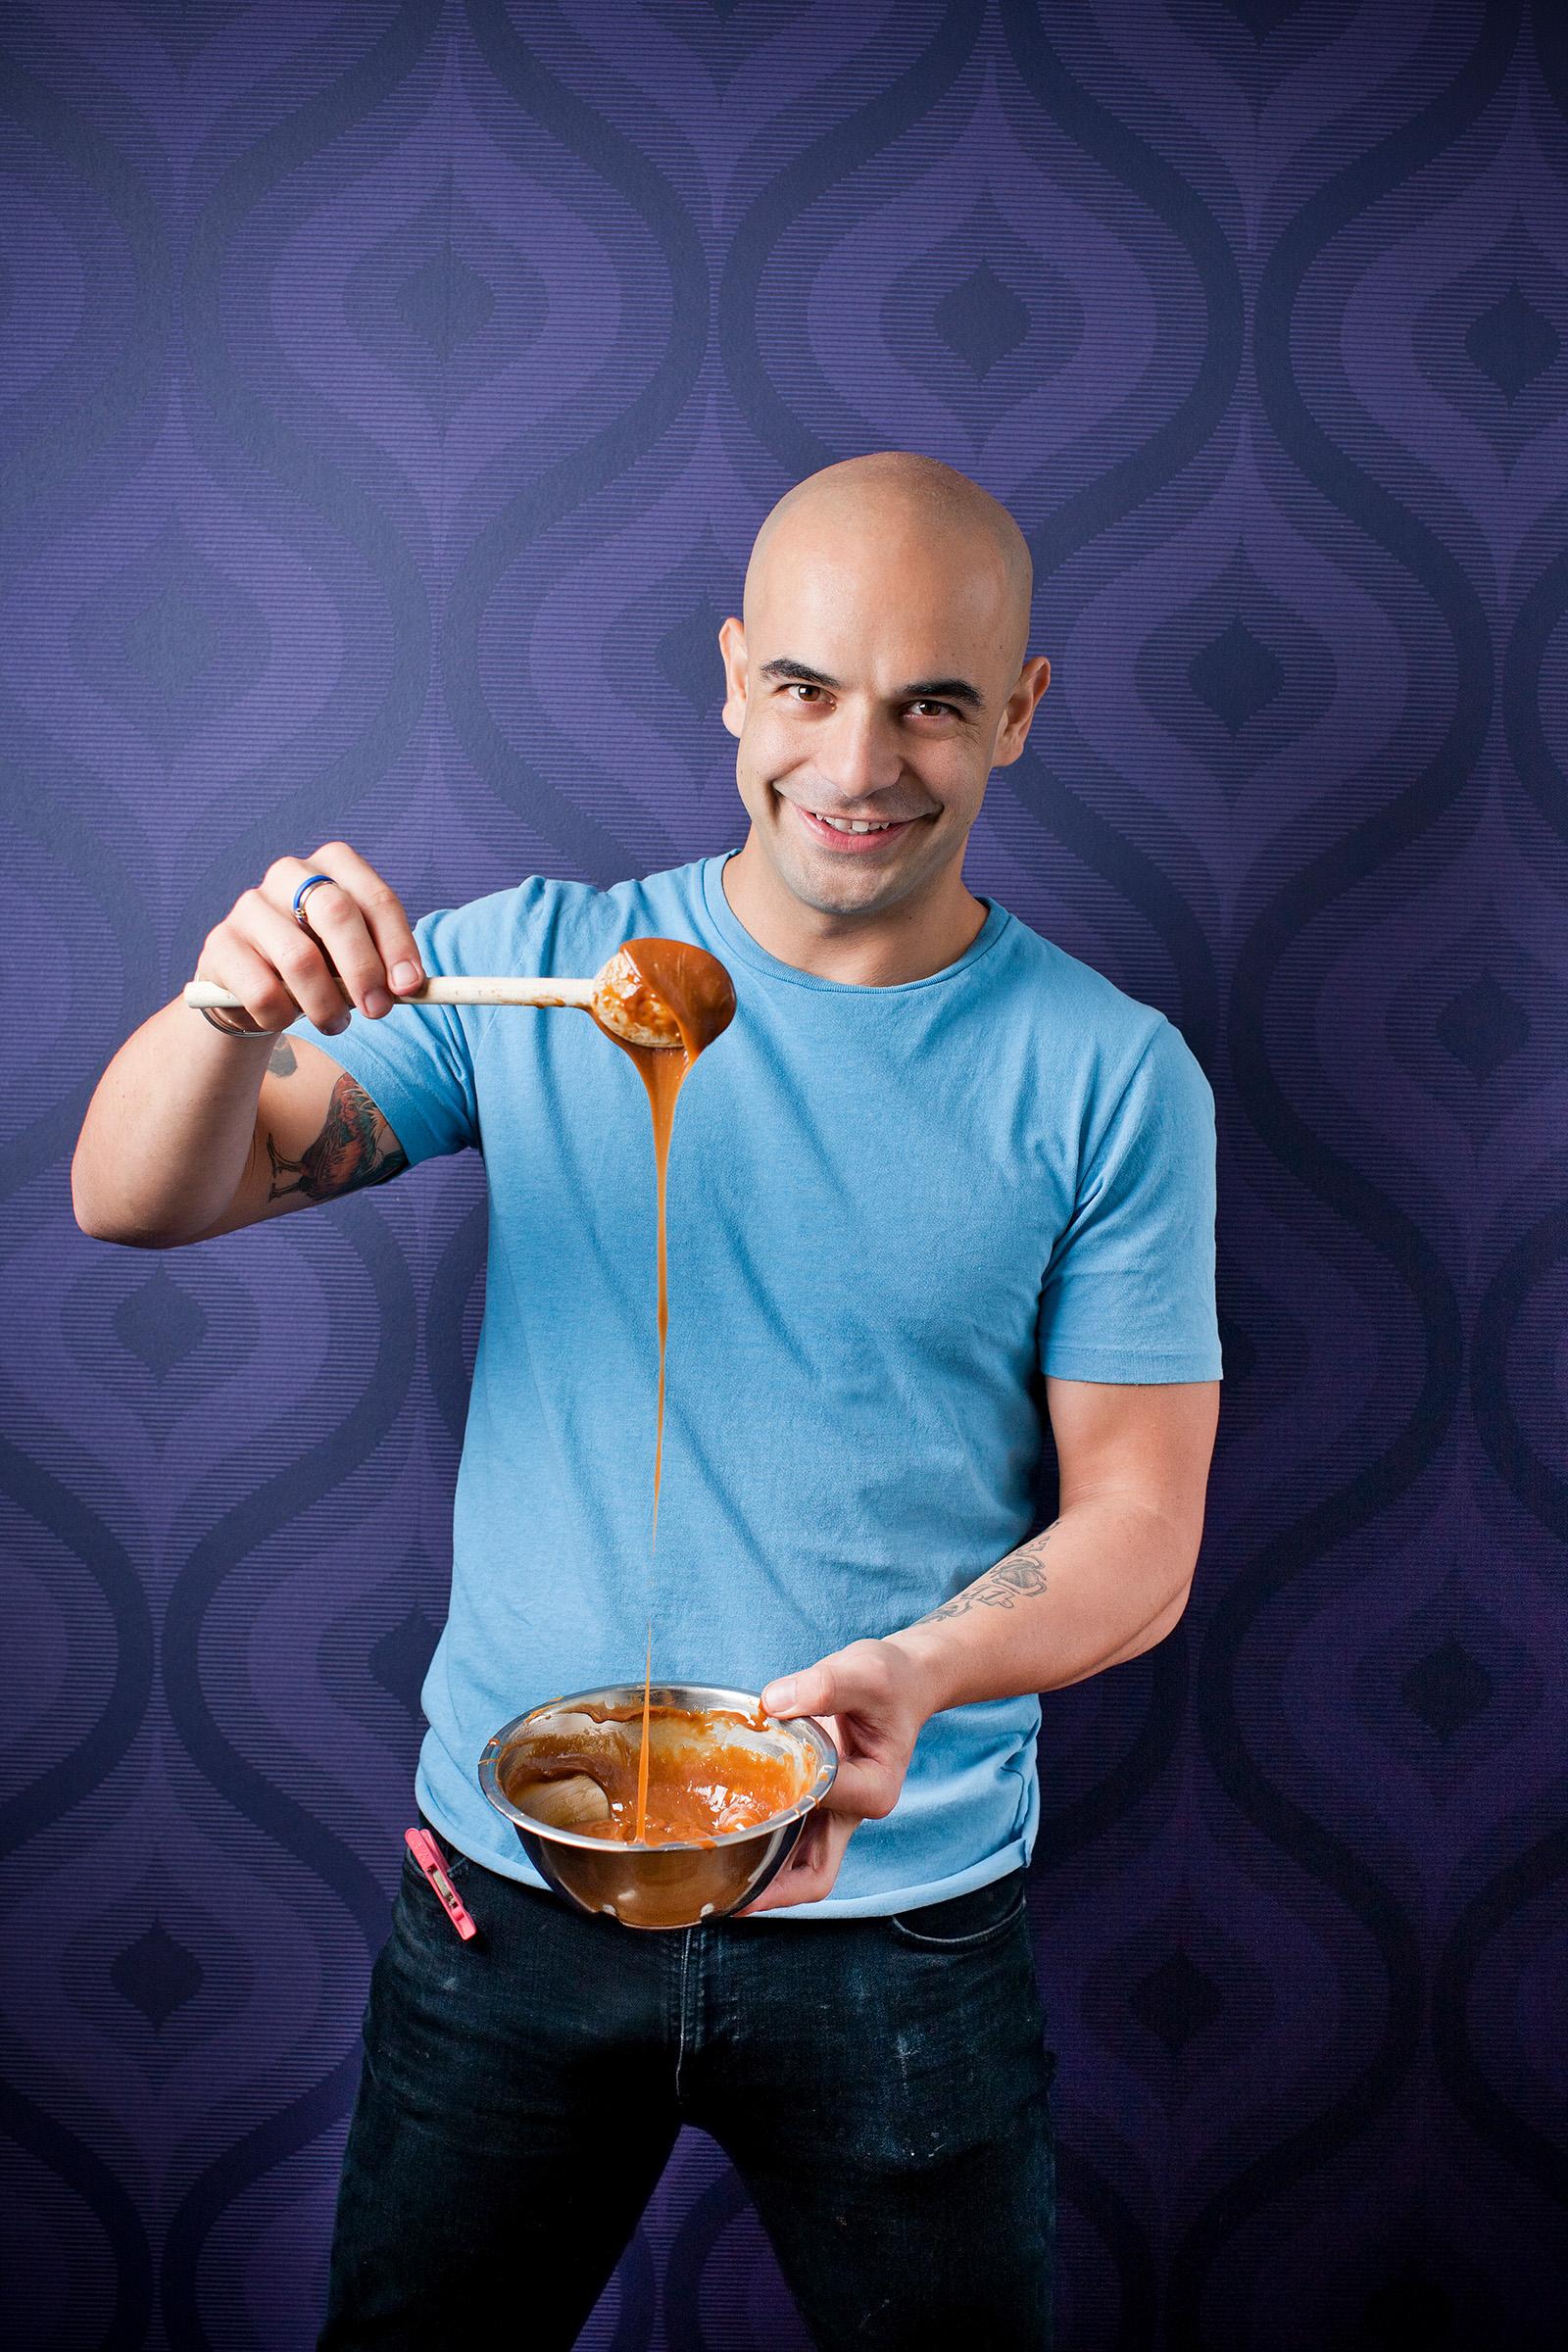 Advertising editorial industry magazine photography Adriano Zumbo Australian patissier pastry chef